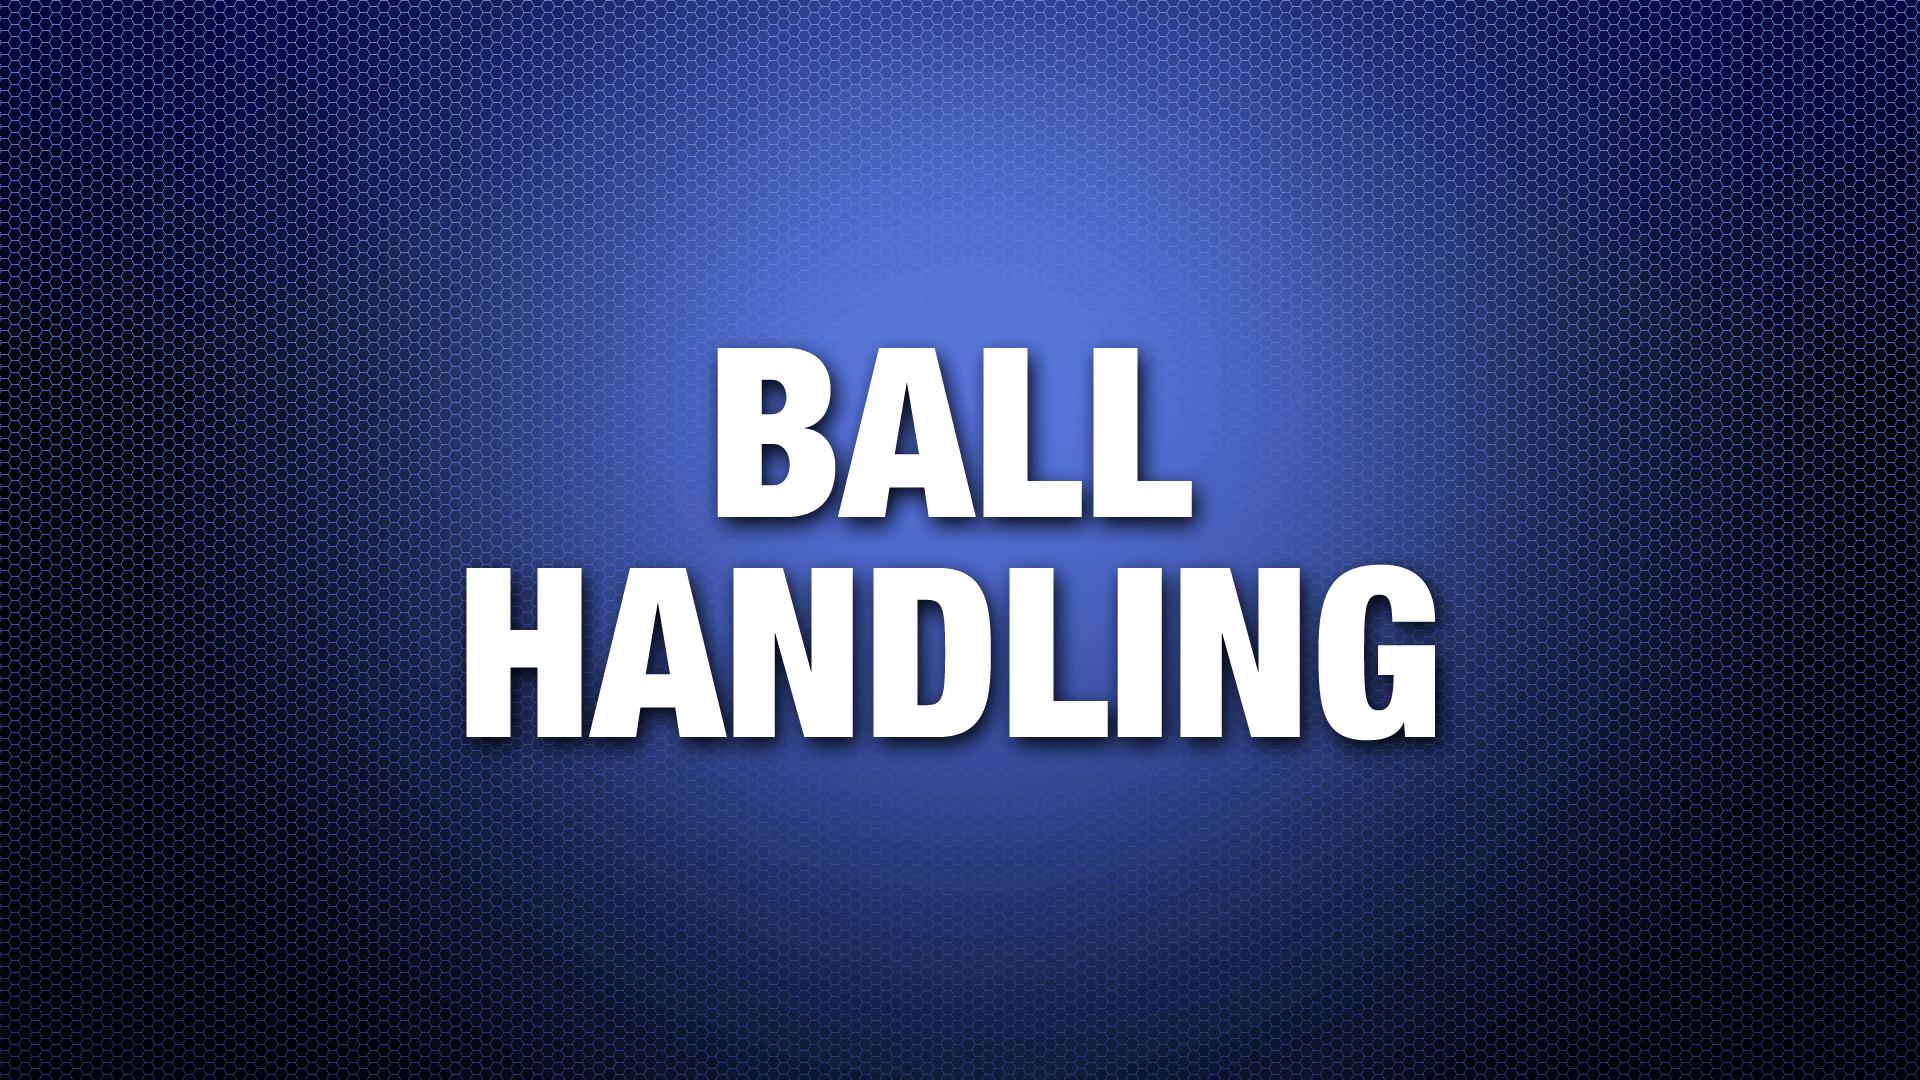 BallHandling